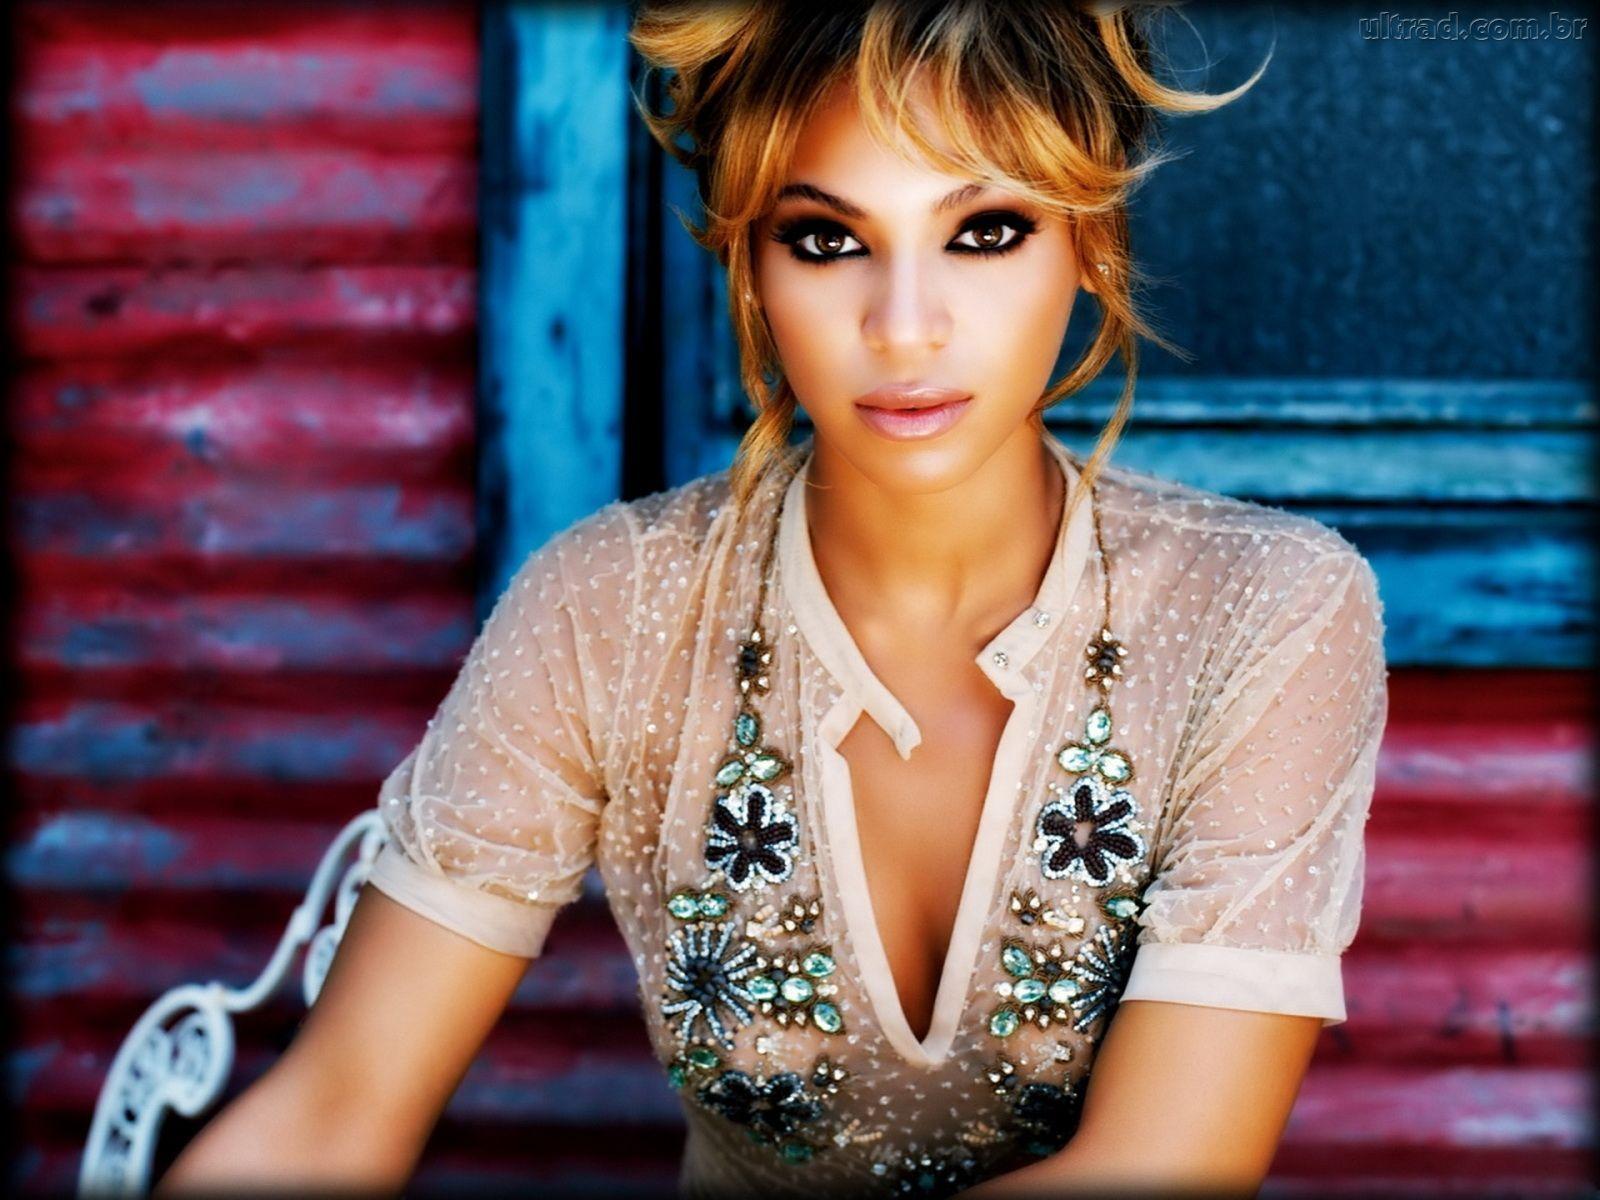 http://1.bp.blogspot.com/-Af_bIpqnDnM/Tv4erIgs-SI/AAAAAAAABYU/u4wh_mv8WtE/s1600/49285_Papel-de-Parede-Beyonce-Knowles_1600x1200.jpg